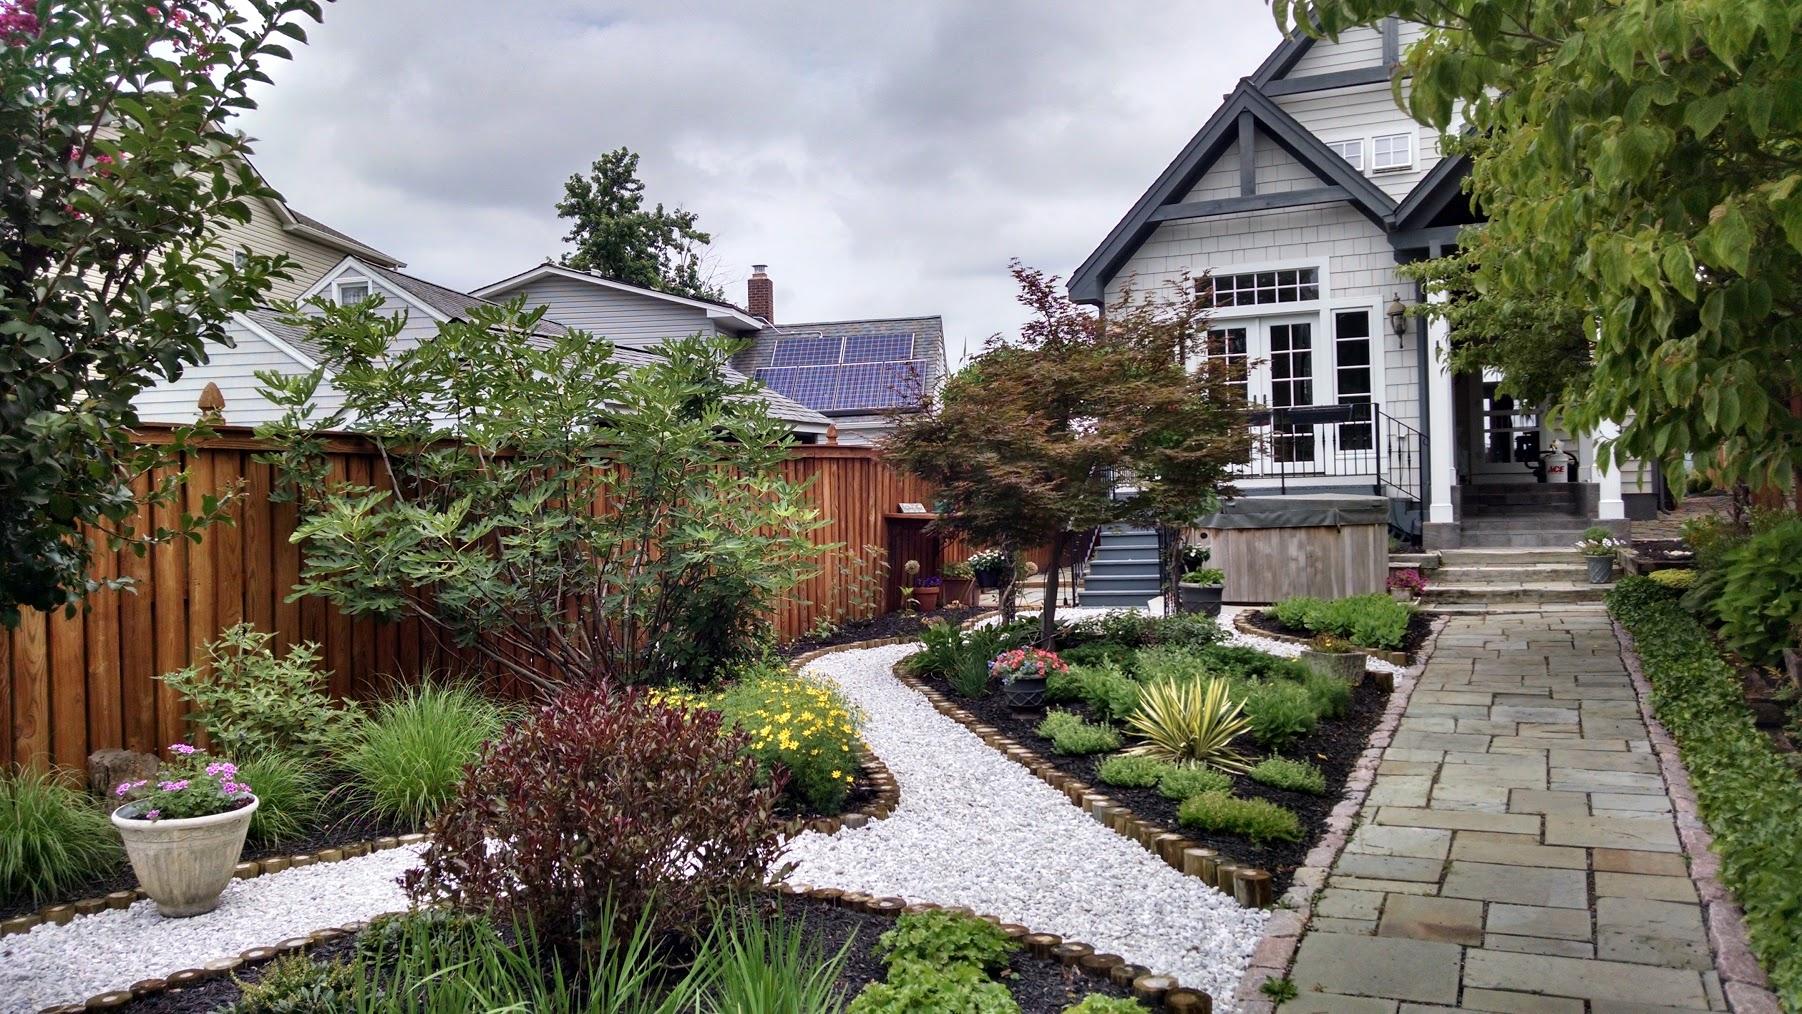 severna park residence homestead gardens landscape division